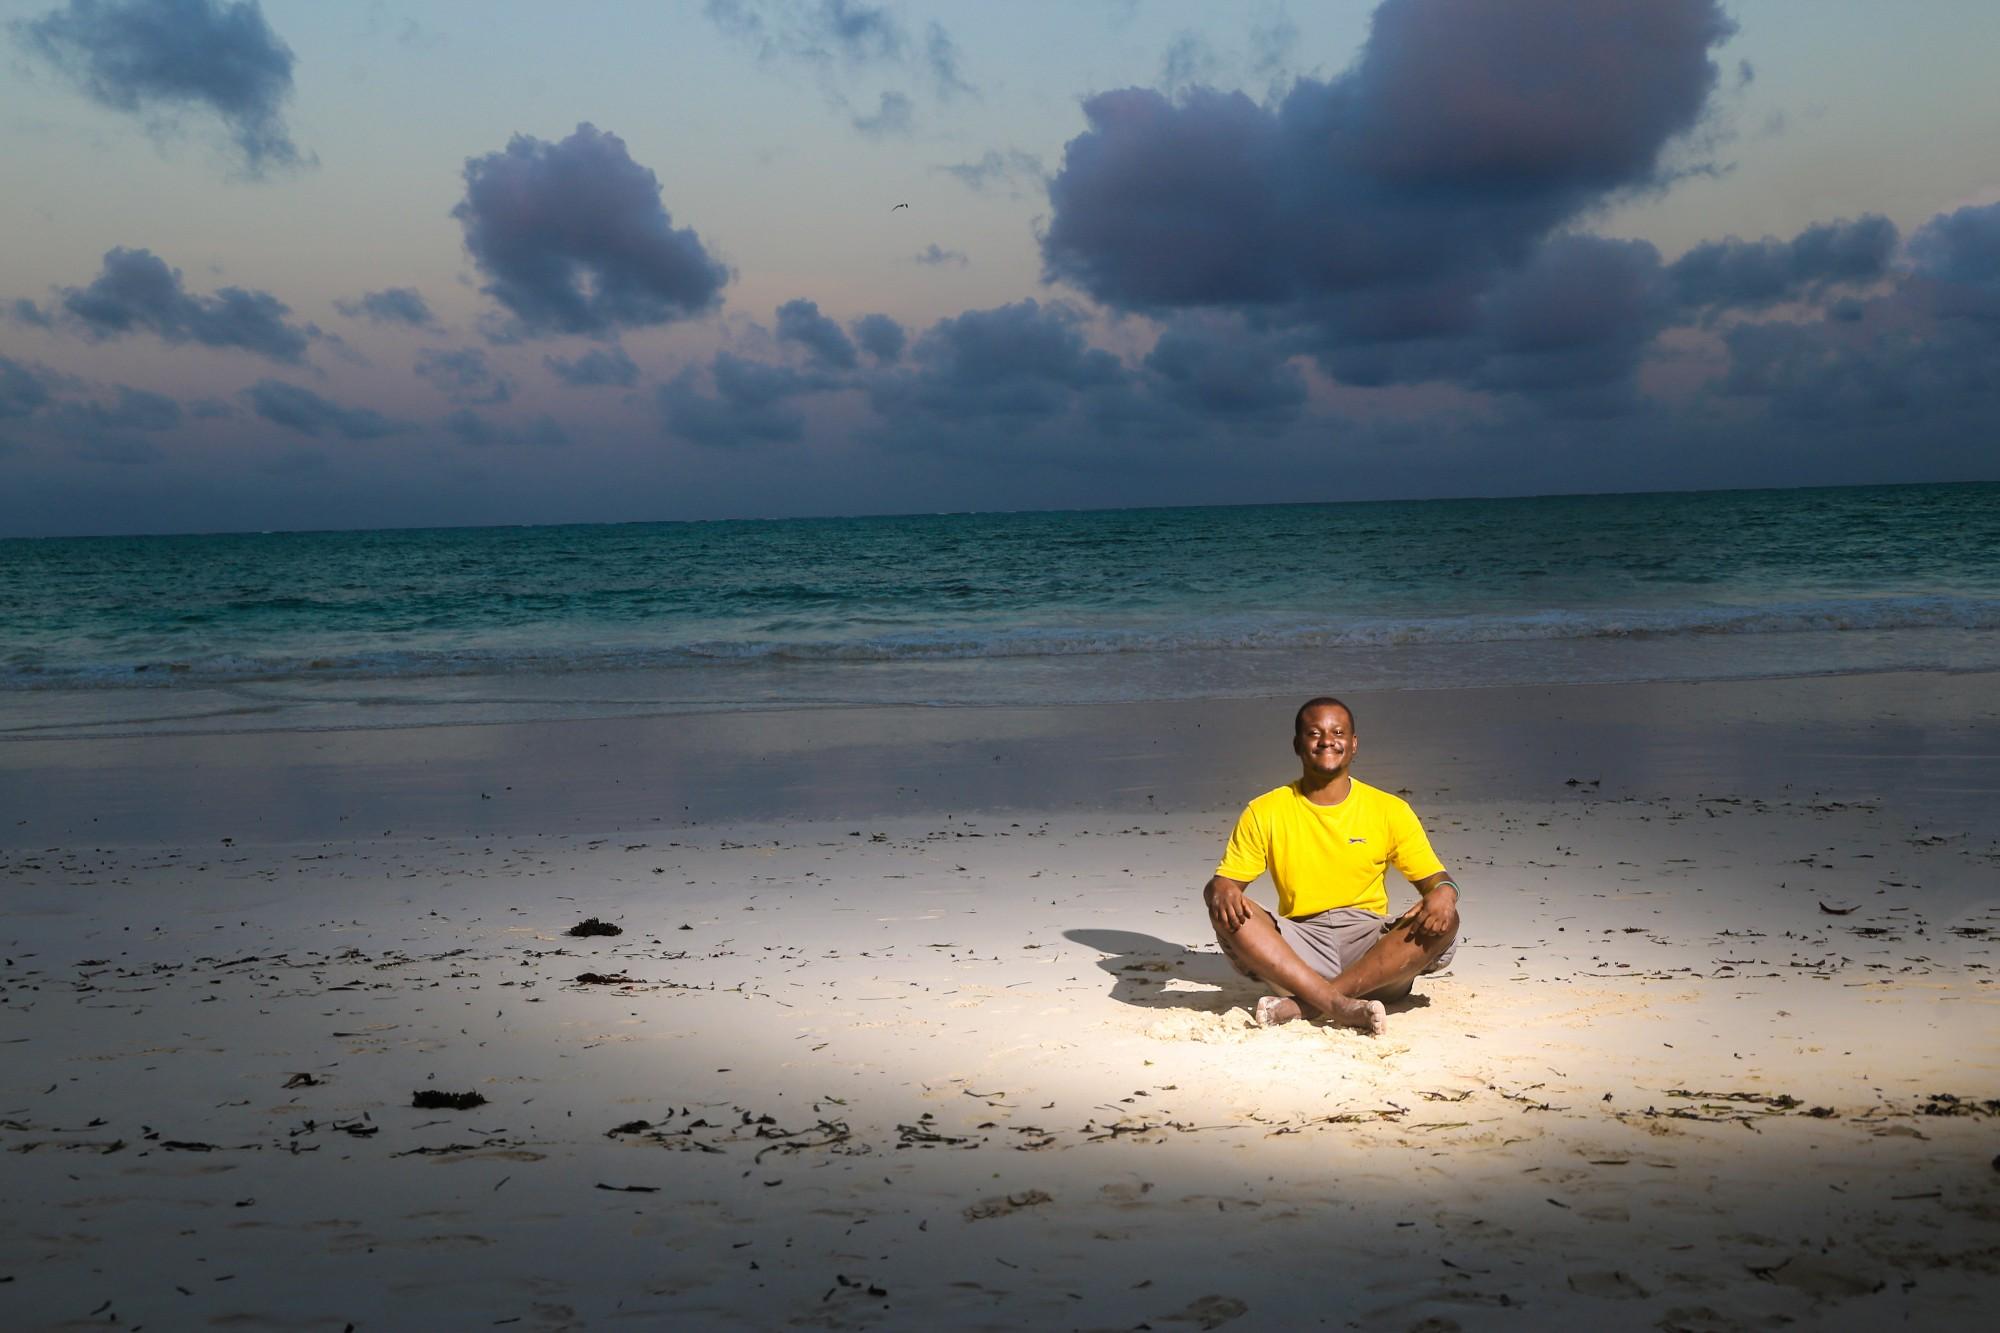 Observations from a 30 days meditation streak